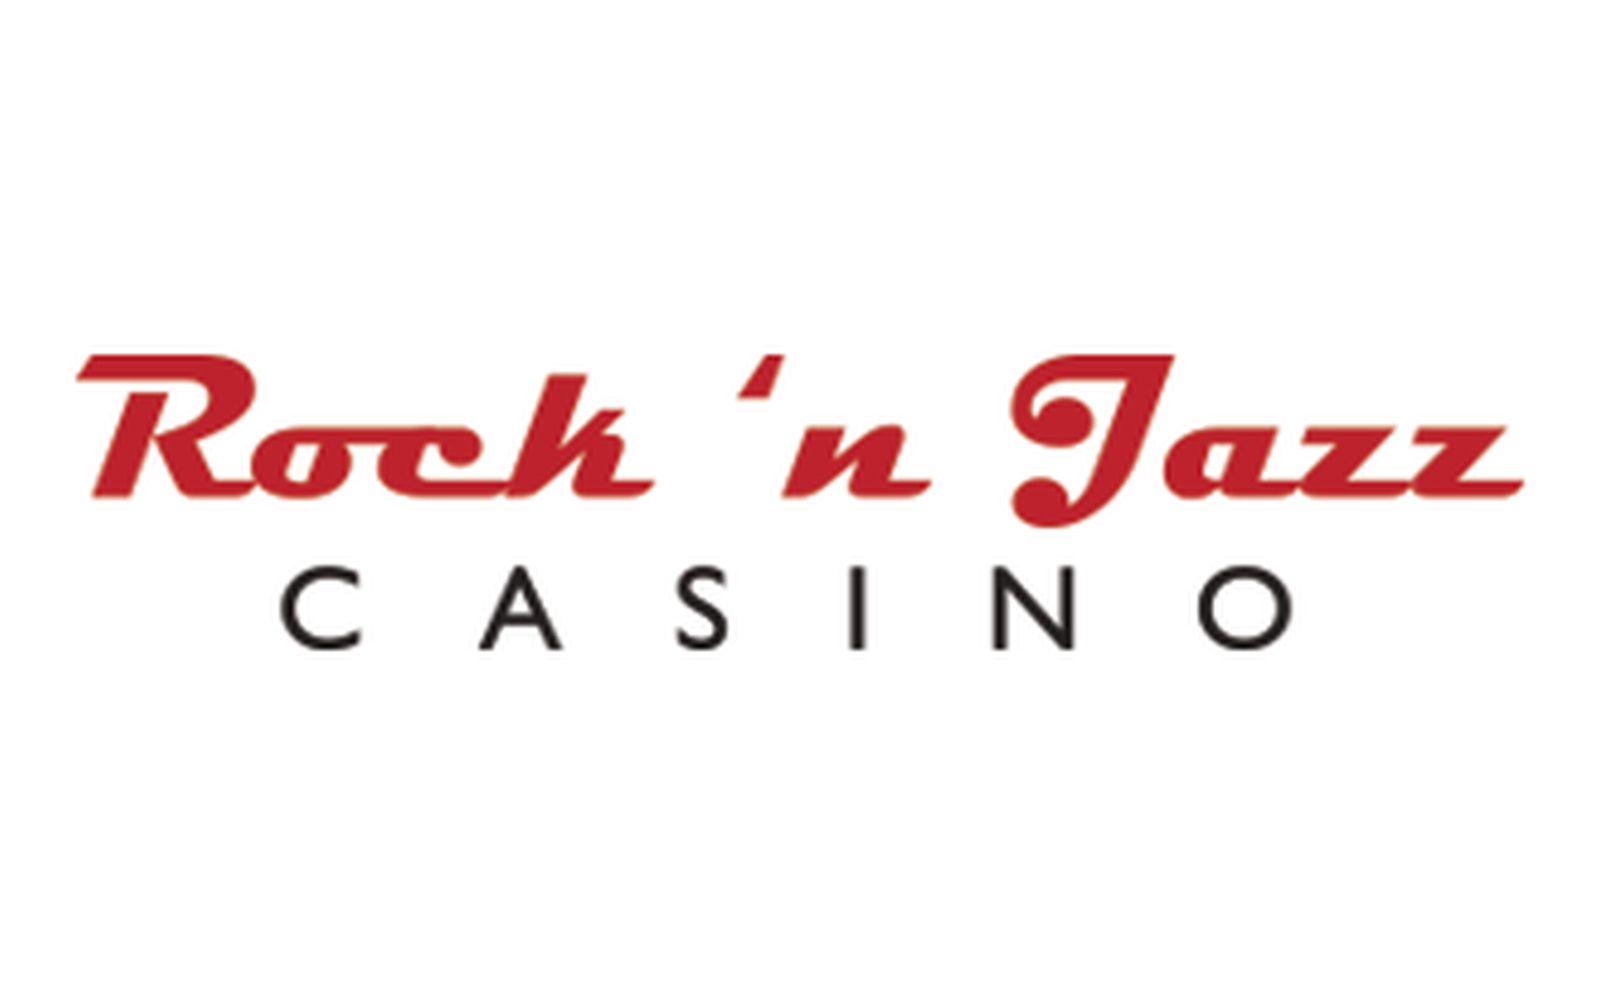 Casino Rock & Jazz